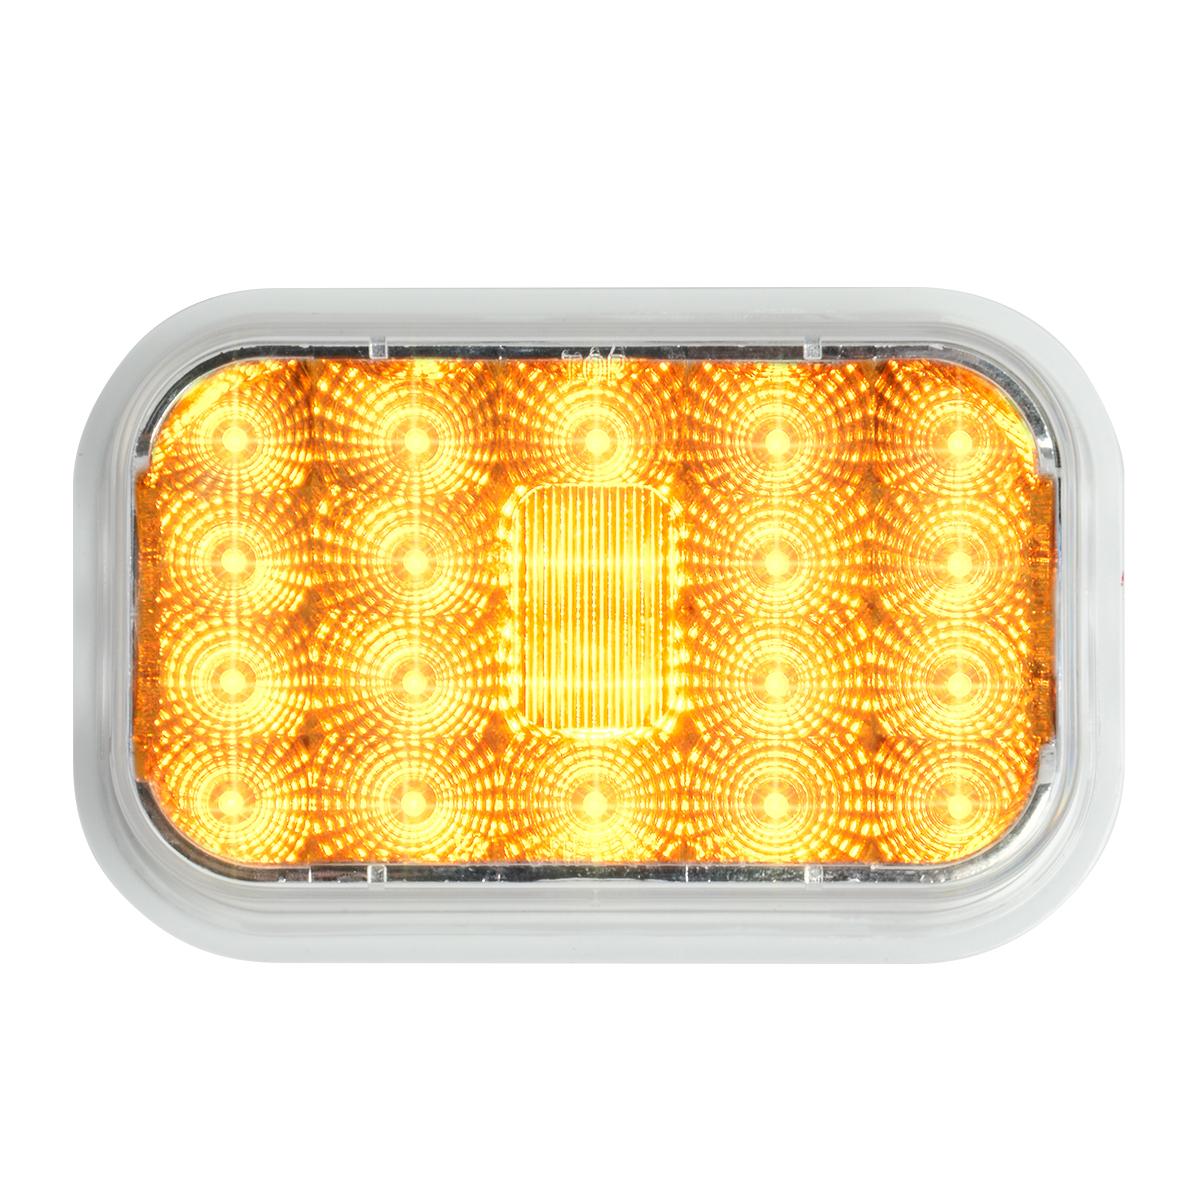 77461 High Profile Rectangular Spyder LED Light in Amber/Clear